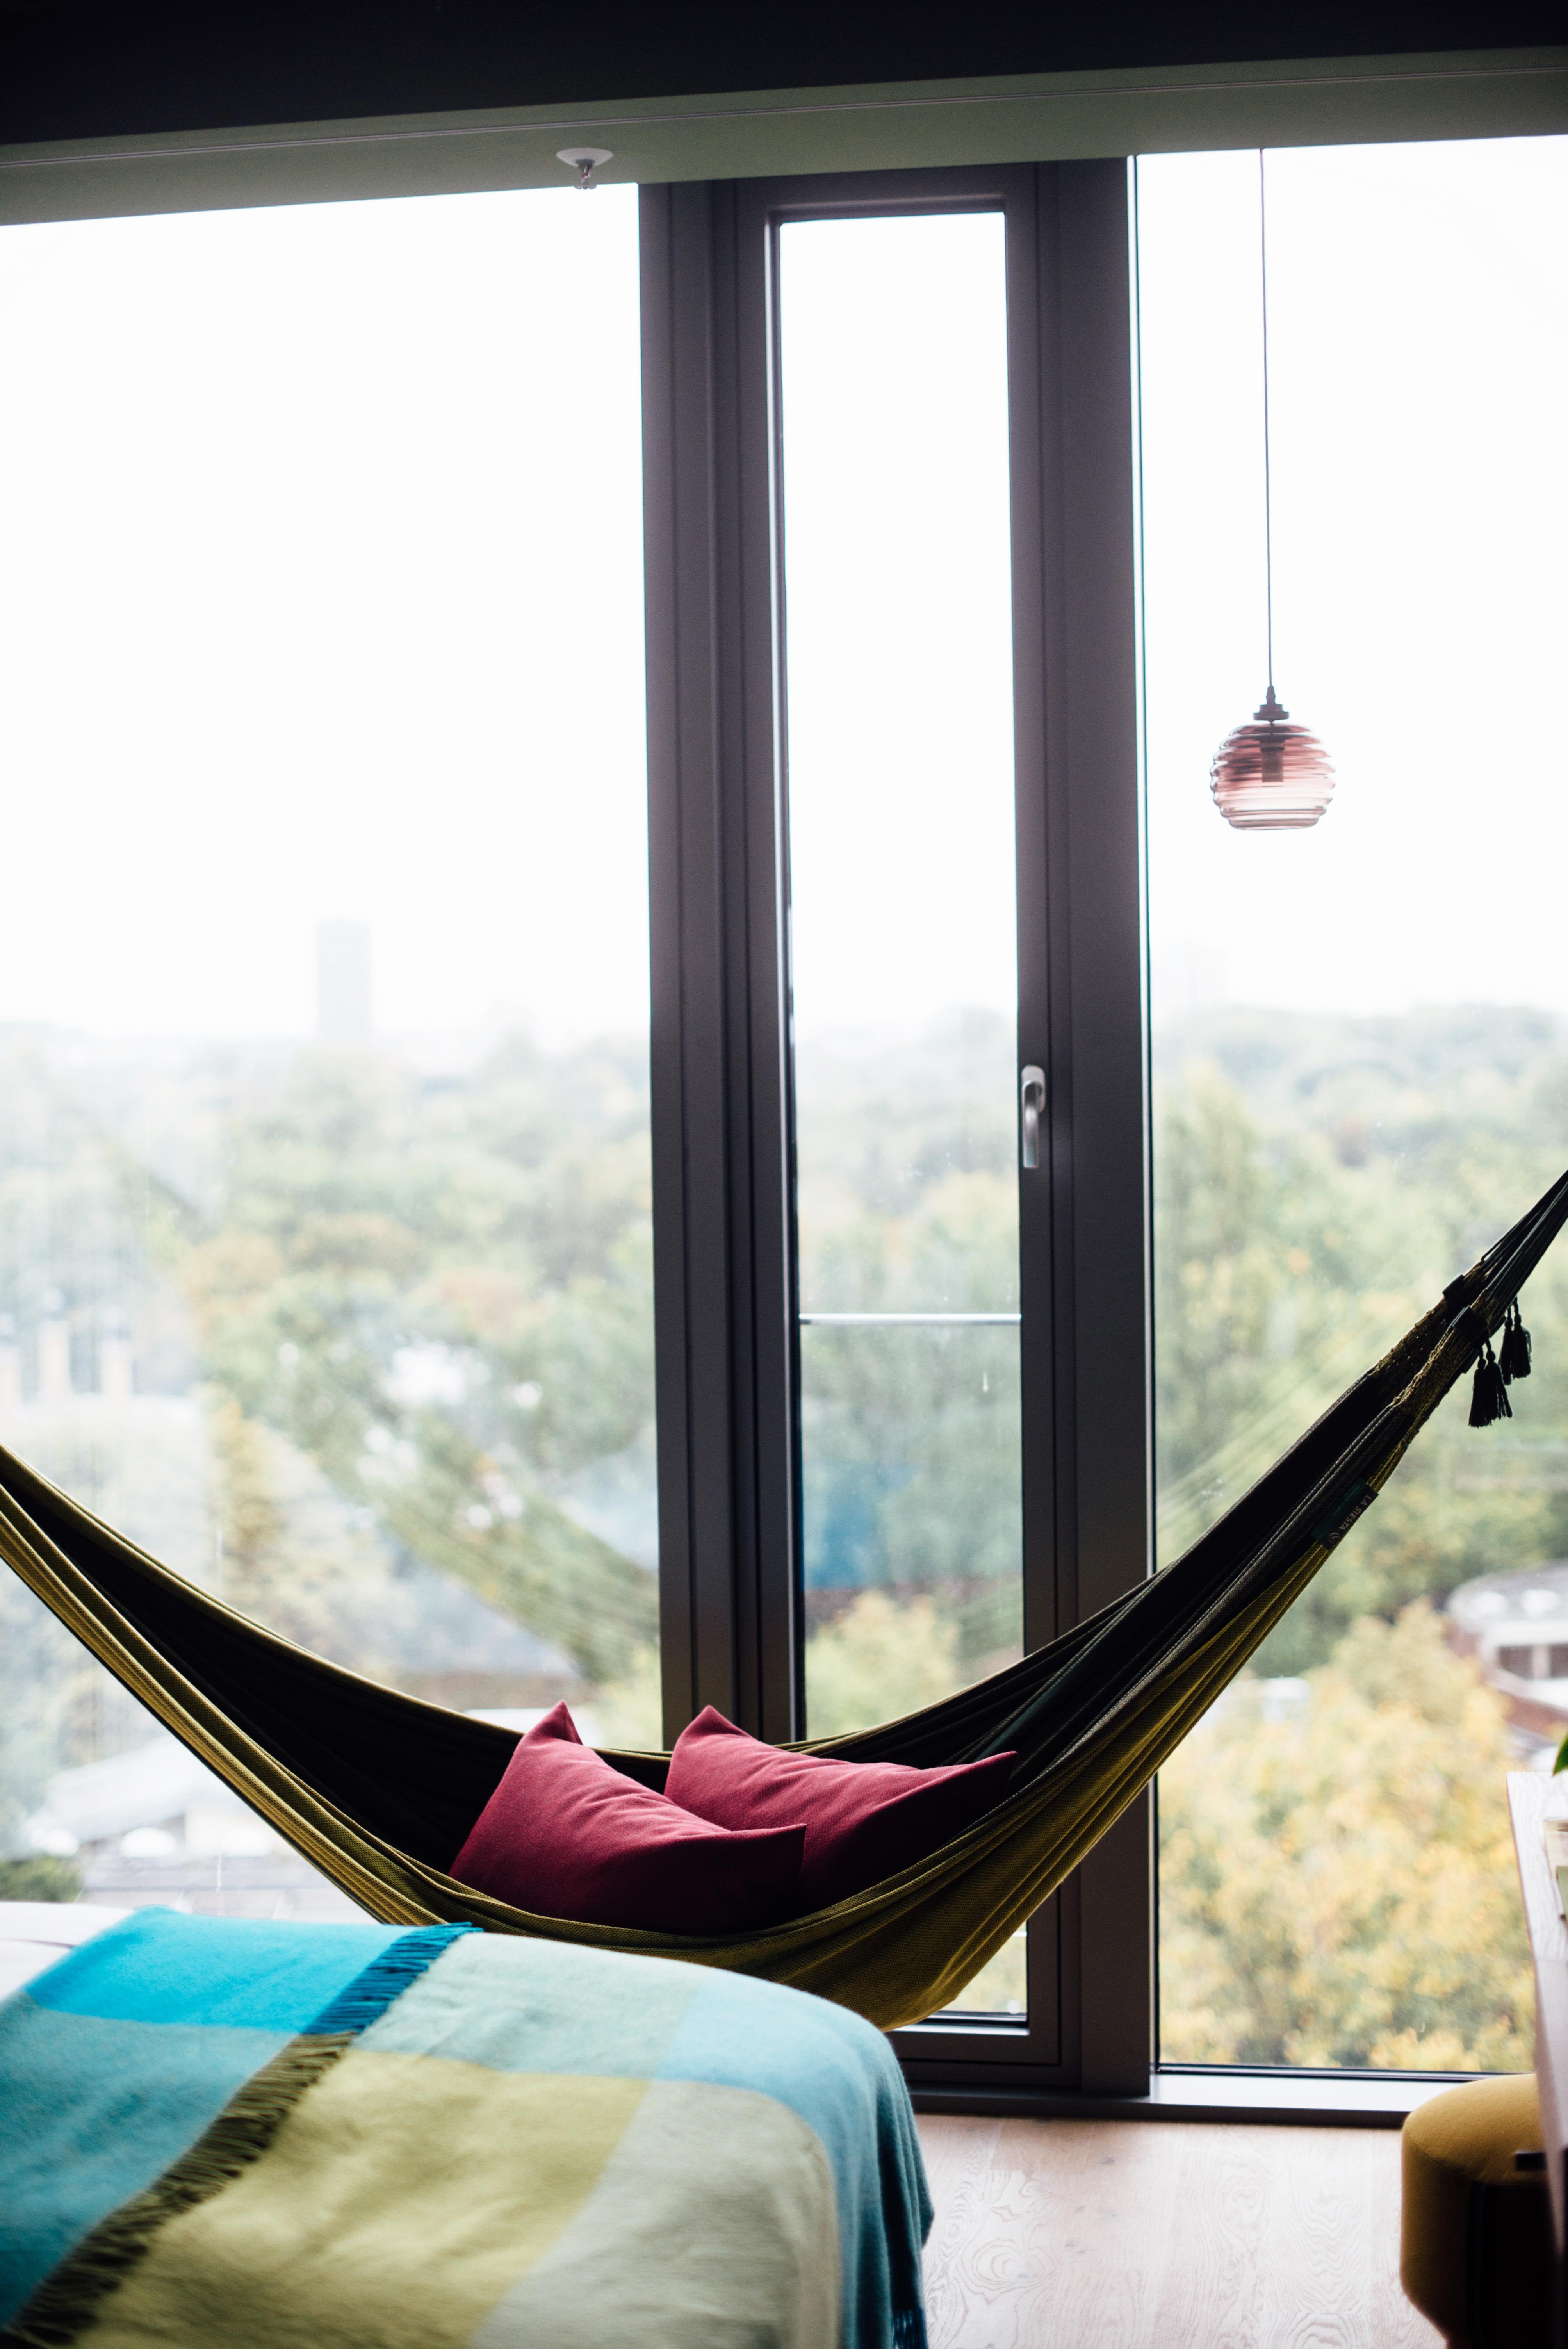 25hours-hotel-bikini-berlin_jungle-sauna_berlin-tiergarten_review_erfahrungsbericht_modeblog_reiseblog_kiamisu-28